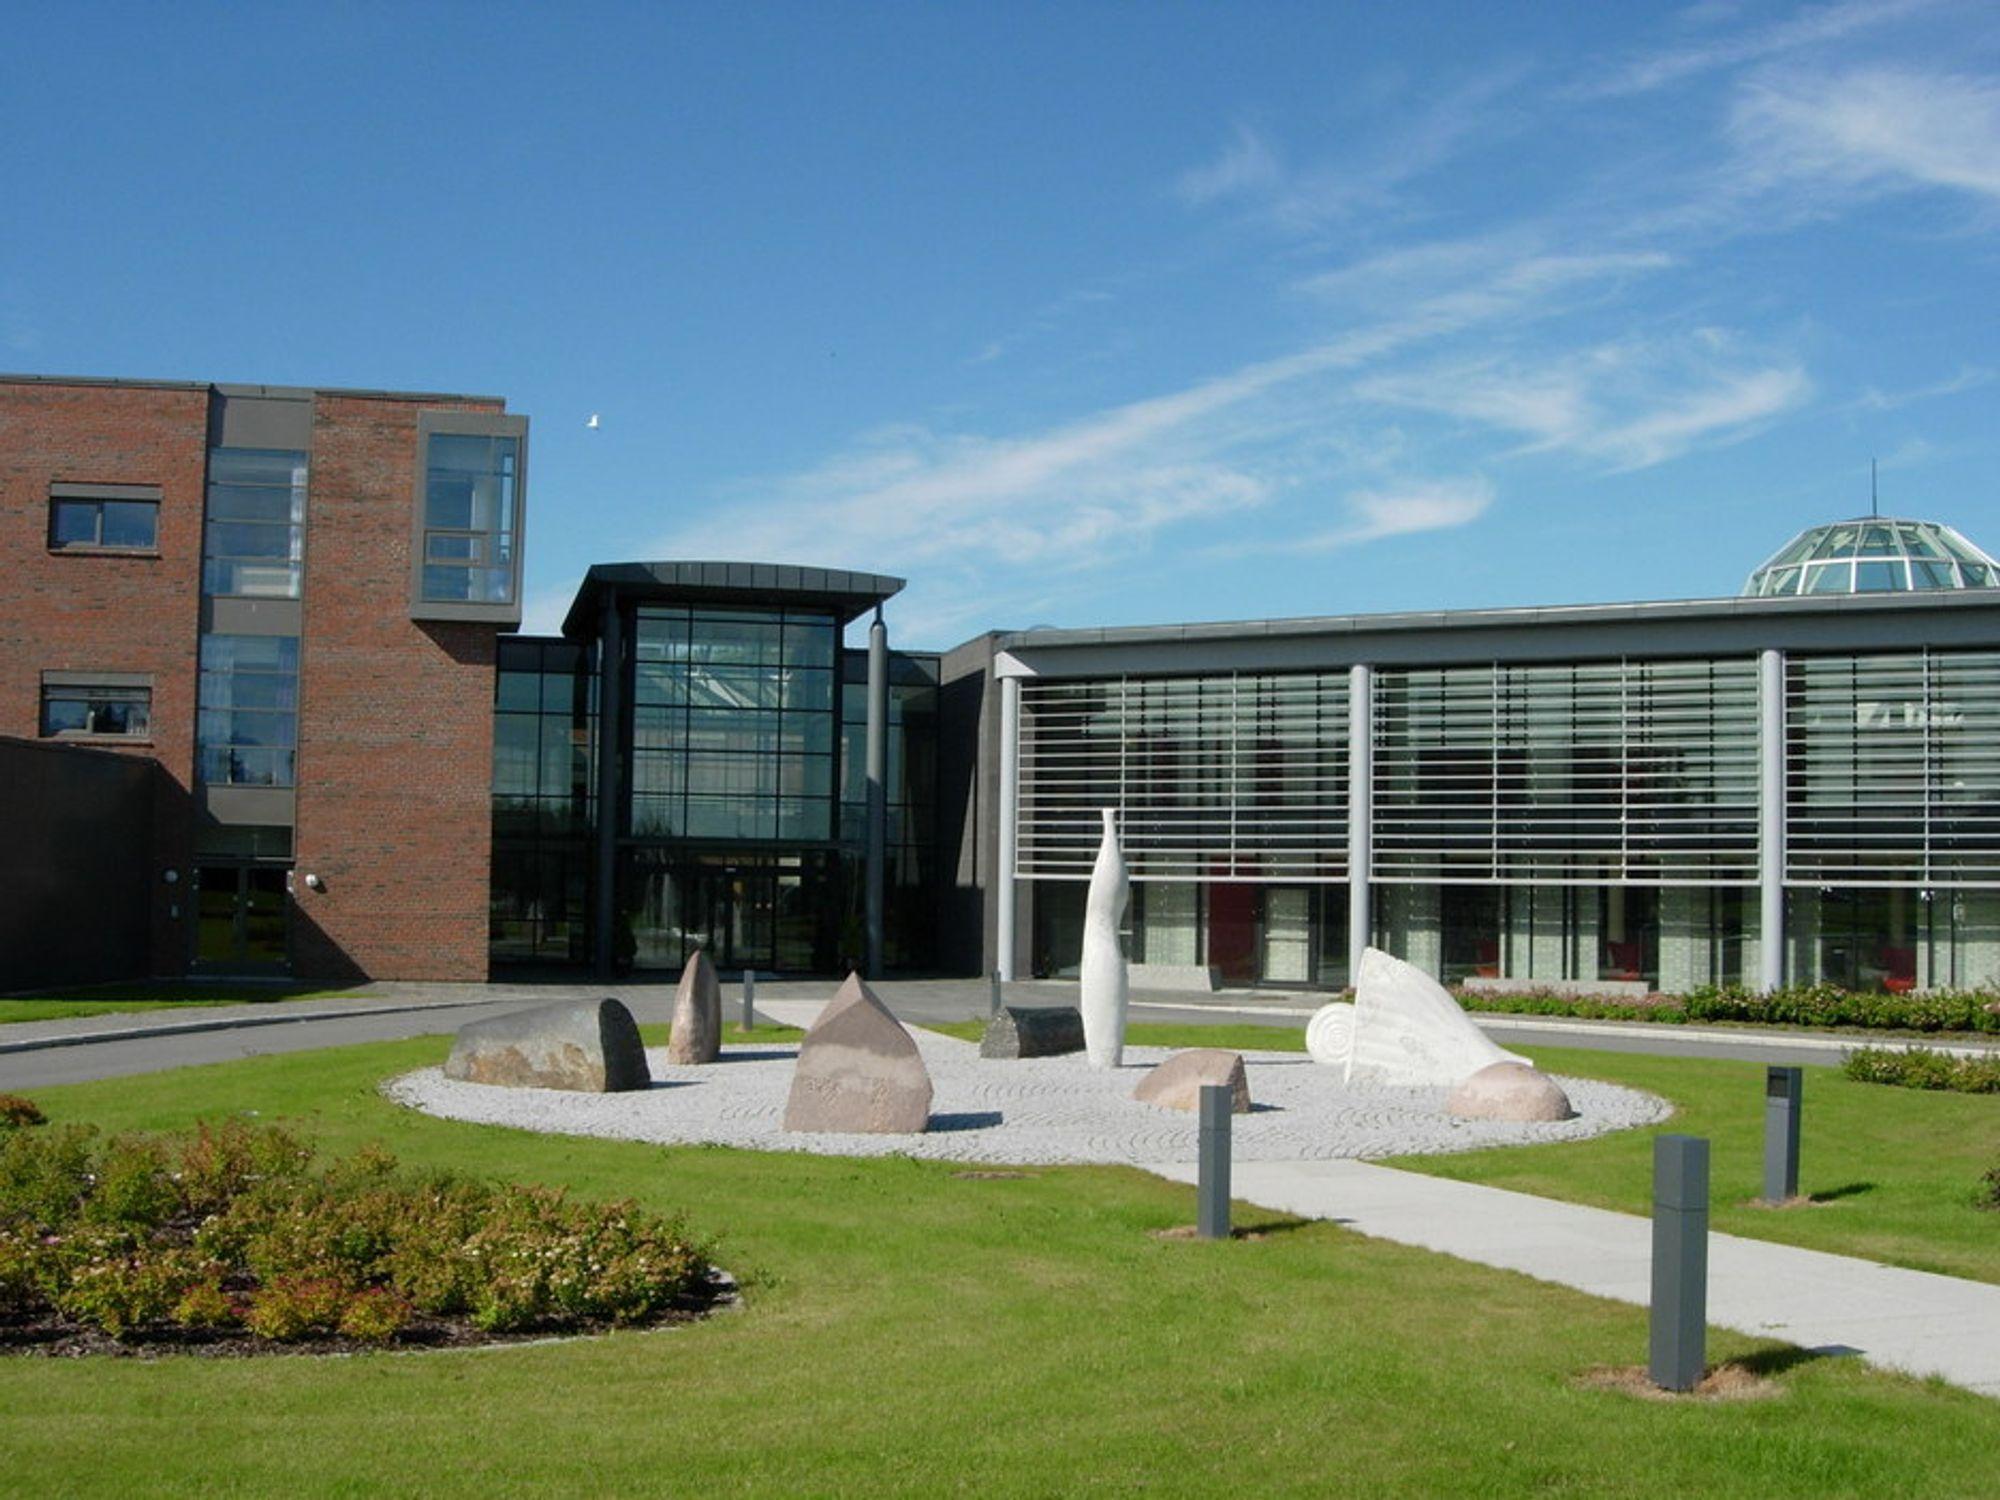 BODØ: Dette blir sannsynligvis Norges 8. universitet.